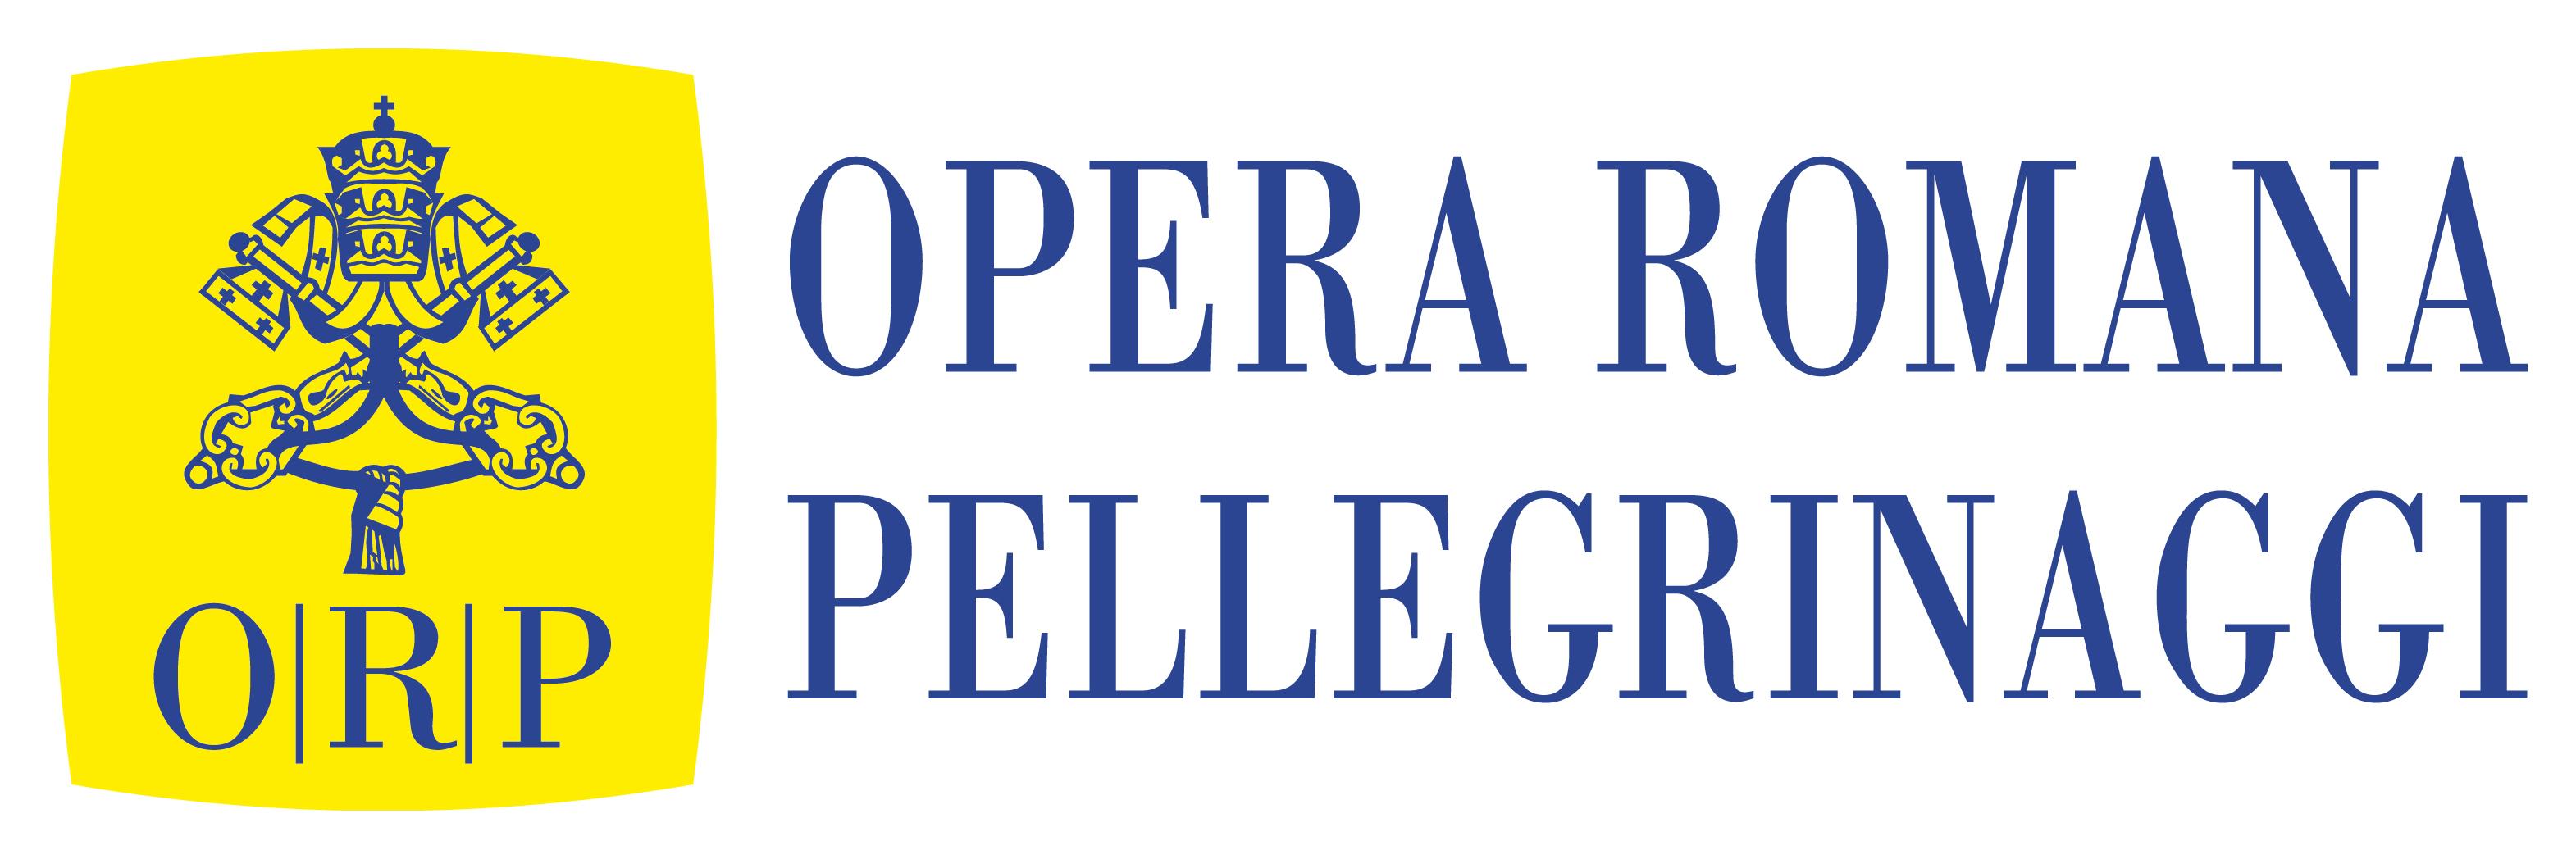 Opera_Romana_Pellegrinaggi